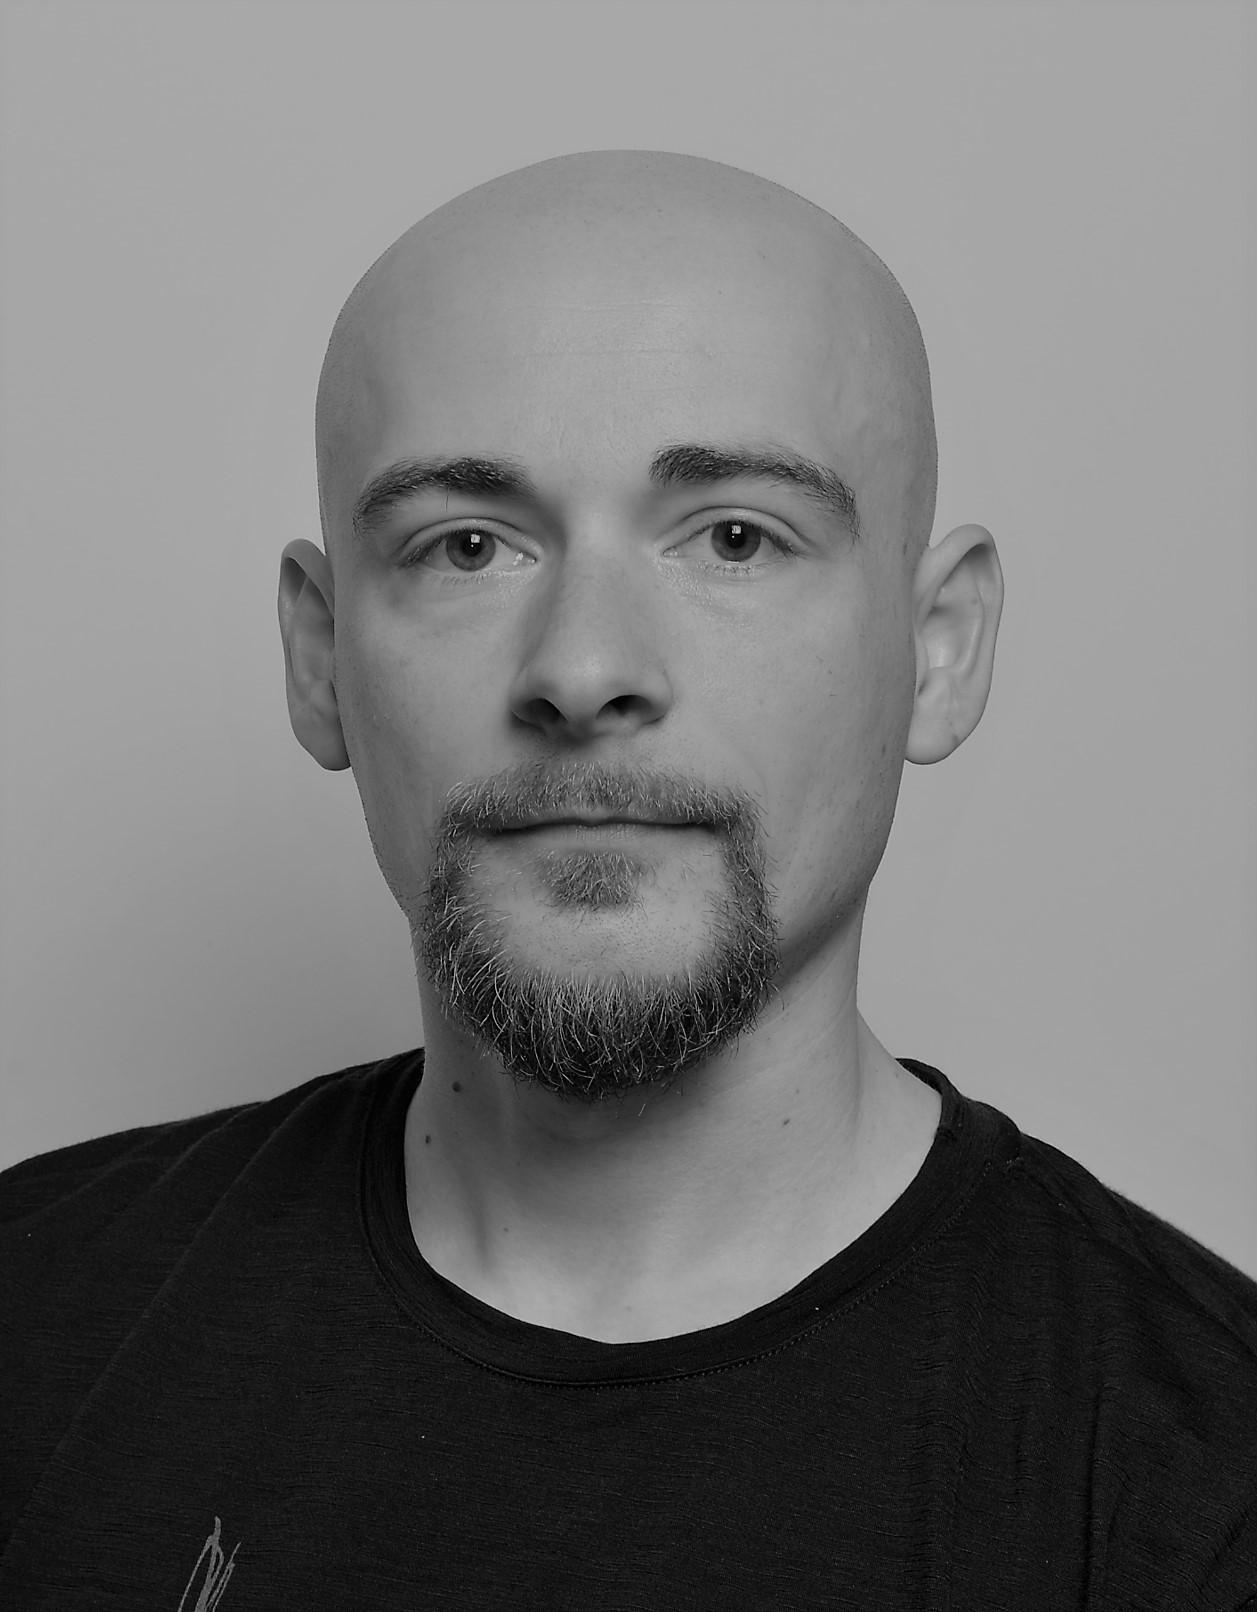 Martin Kandlhofer